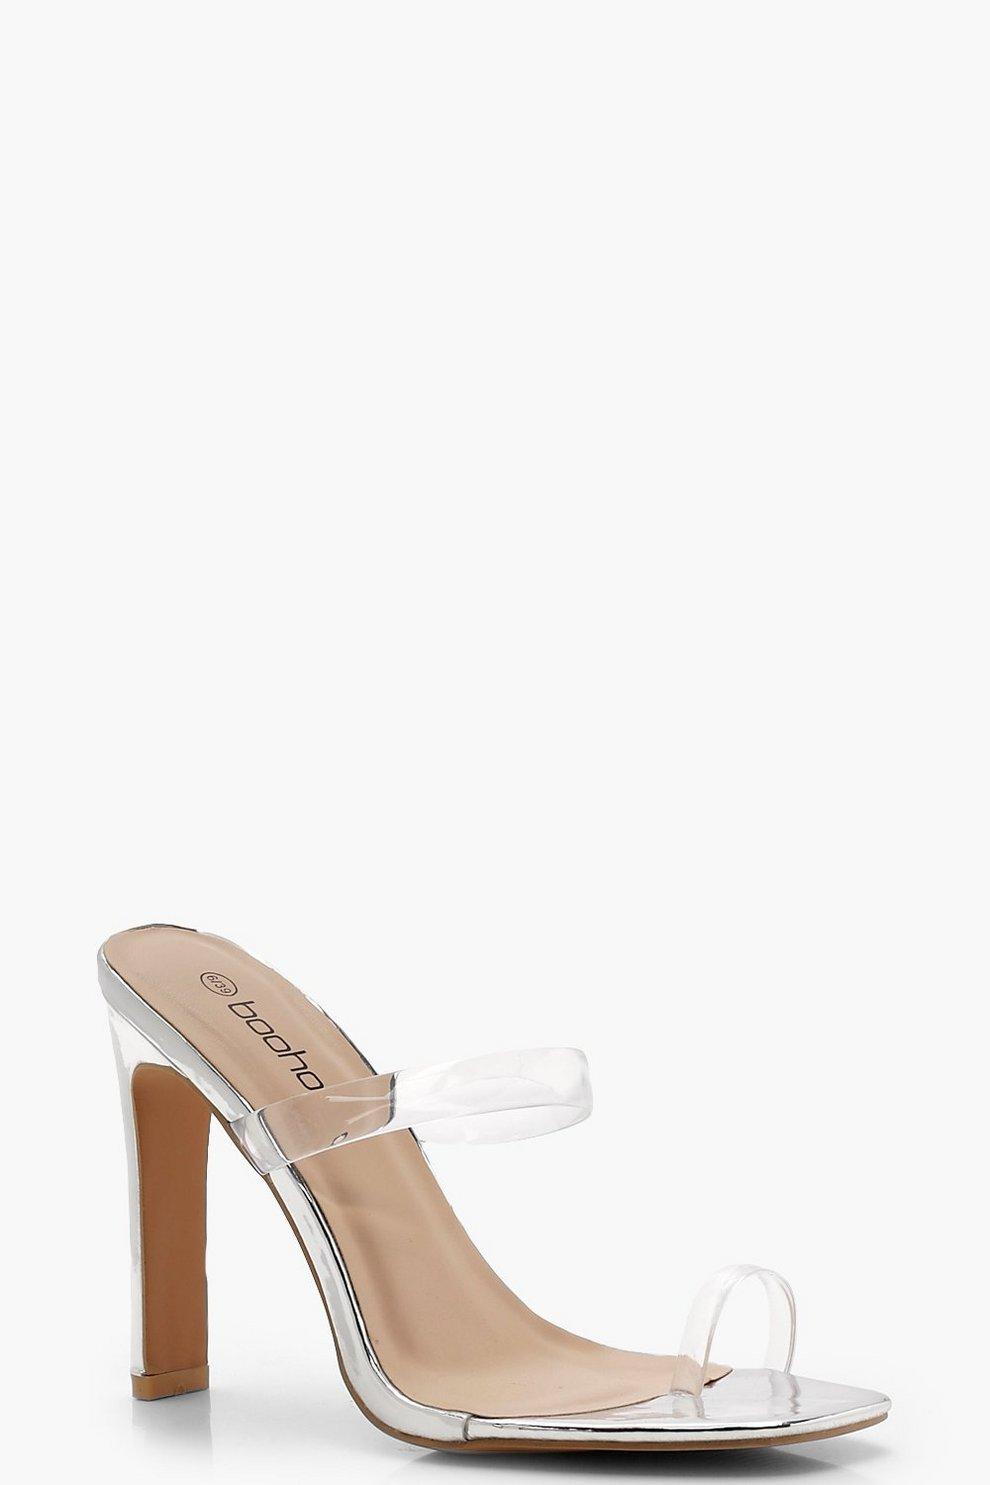 ccd2bd6816 Clear Strap Skinny Mule Heels | Boohoo